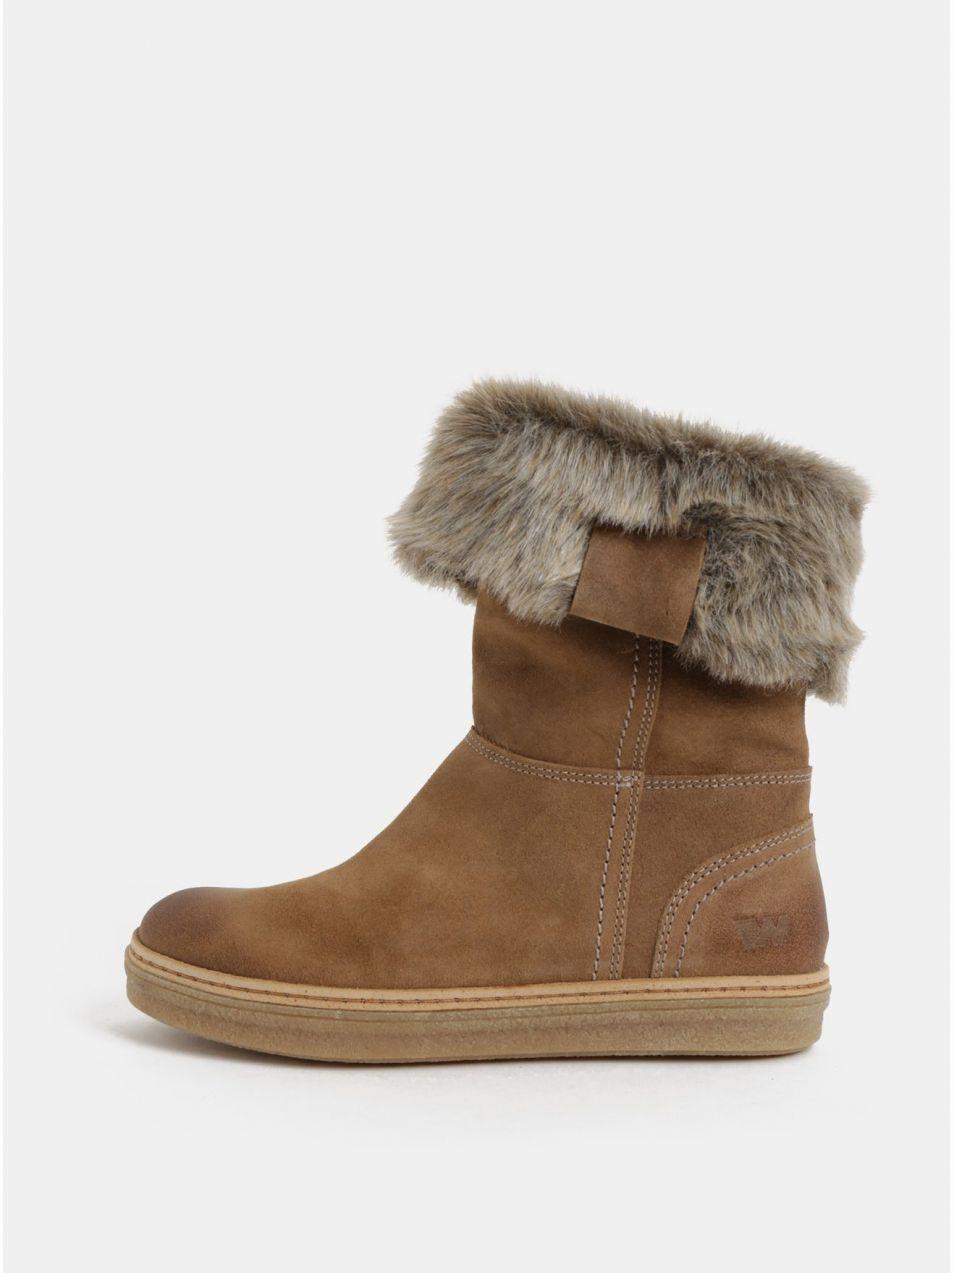 02e3aa65c0 Svetlohnedé dámske semišové členkové zimné topánky s umelou kožušinkou  Weinbrenner